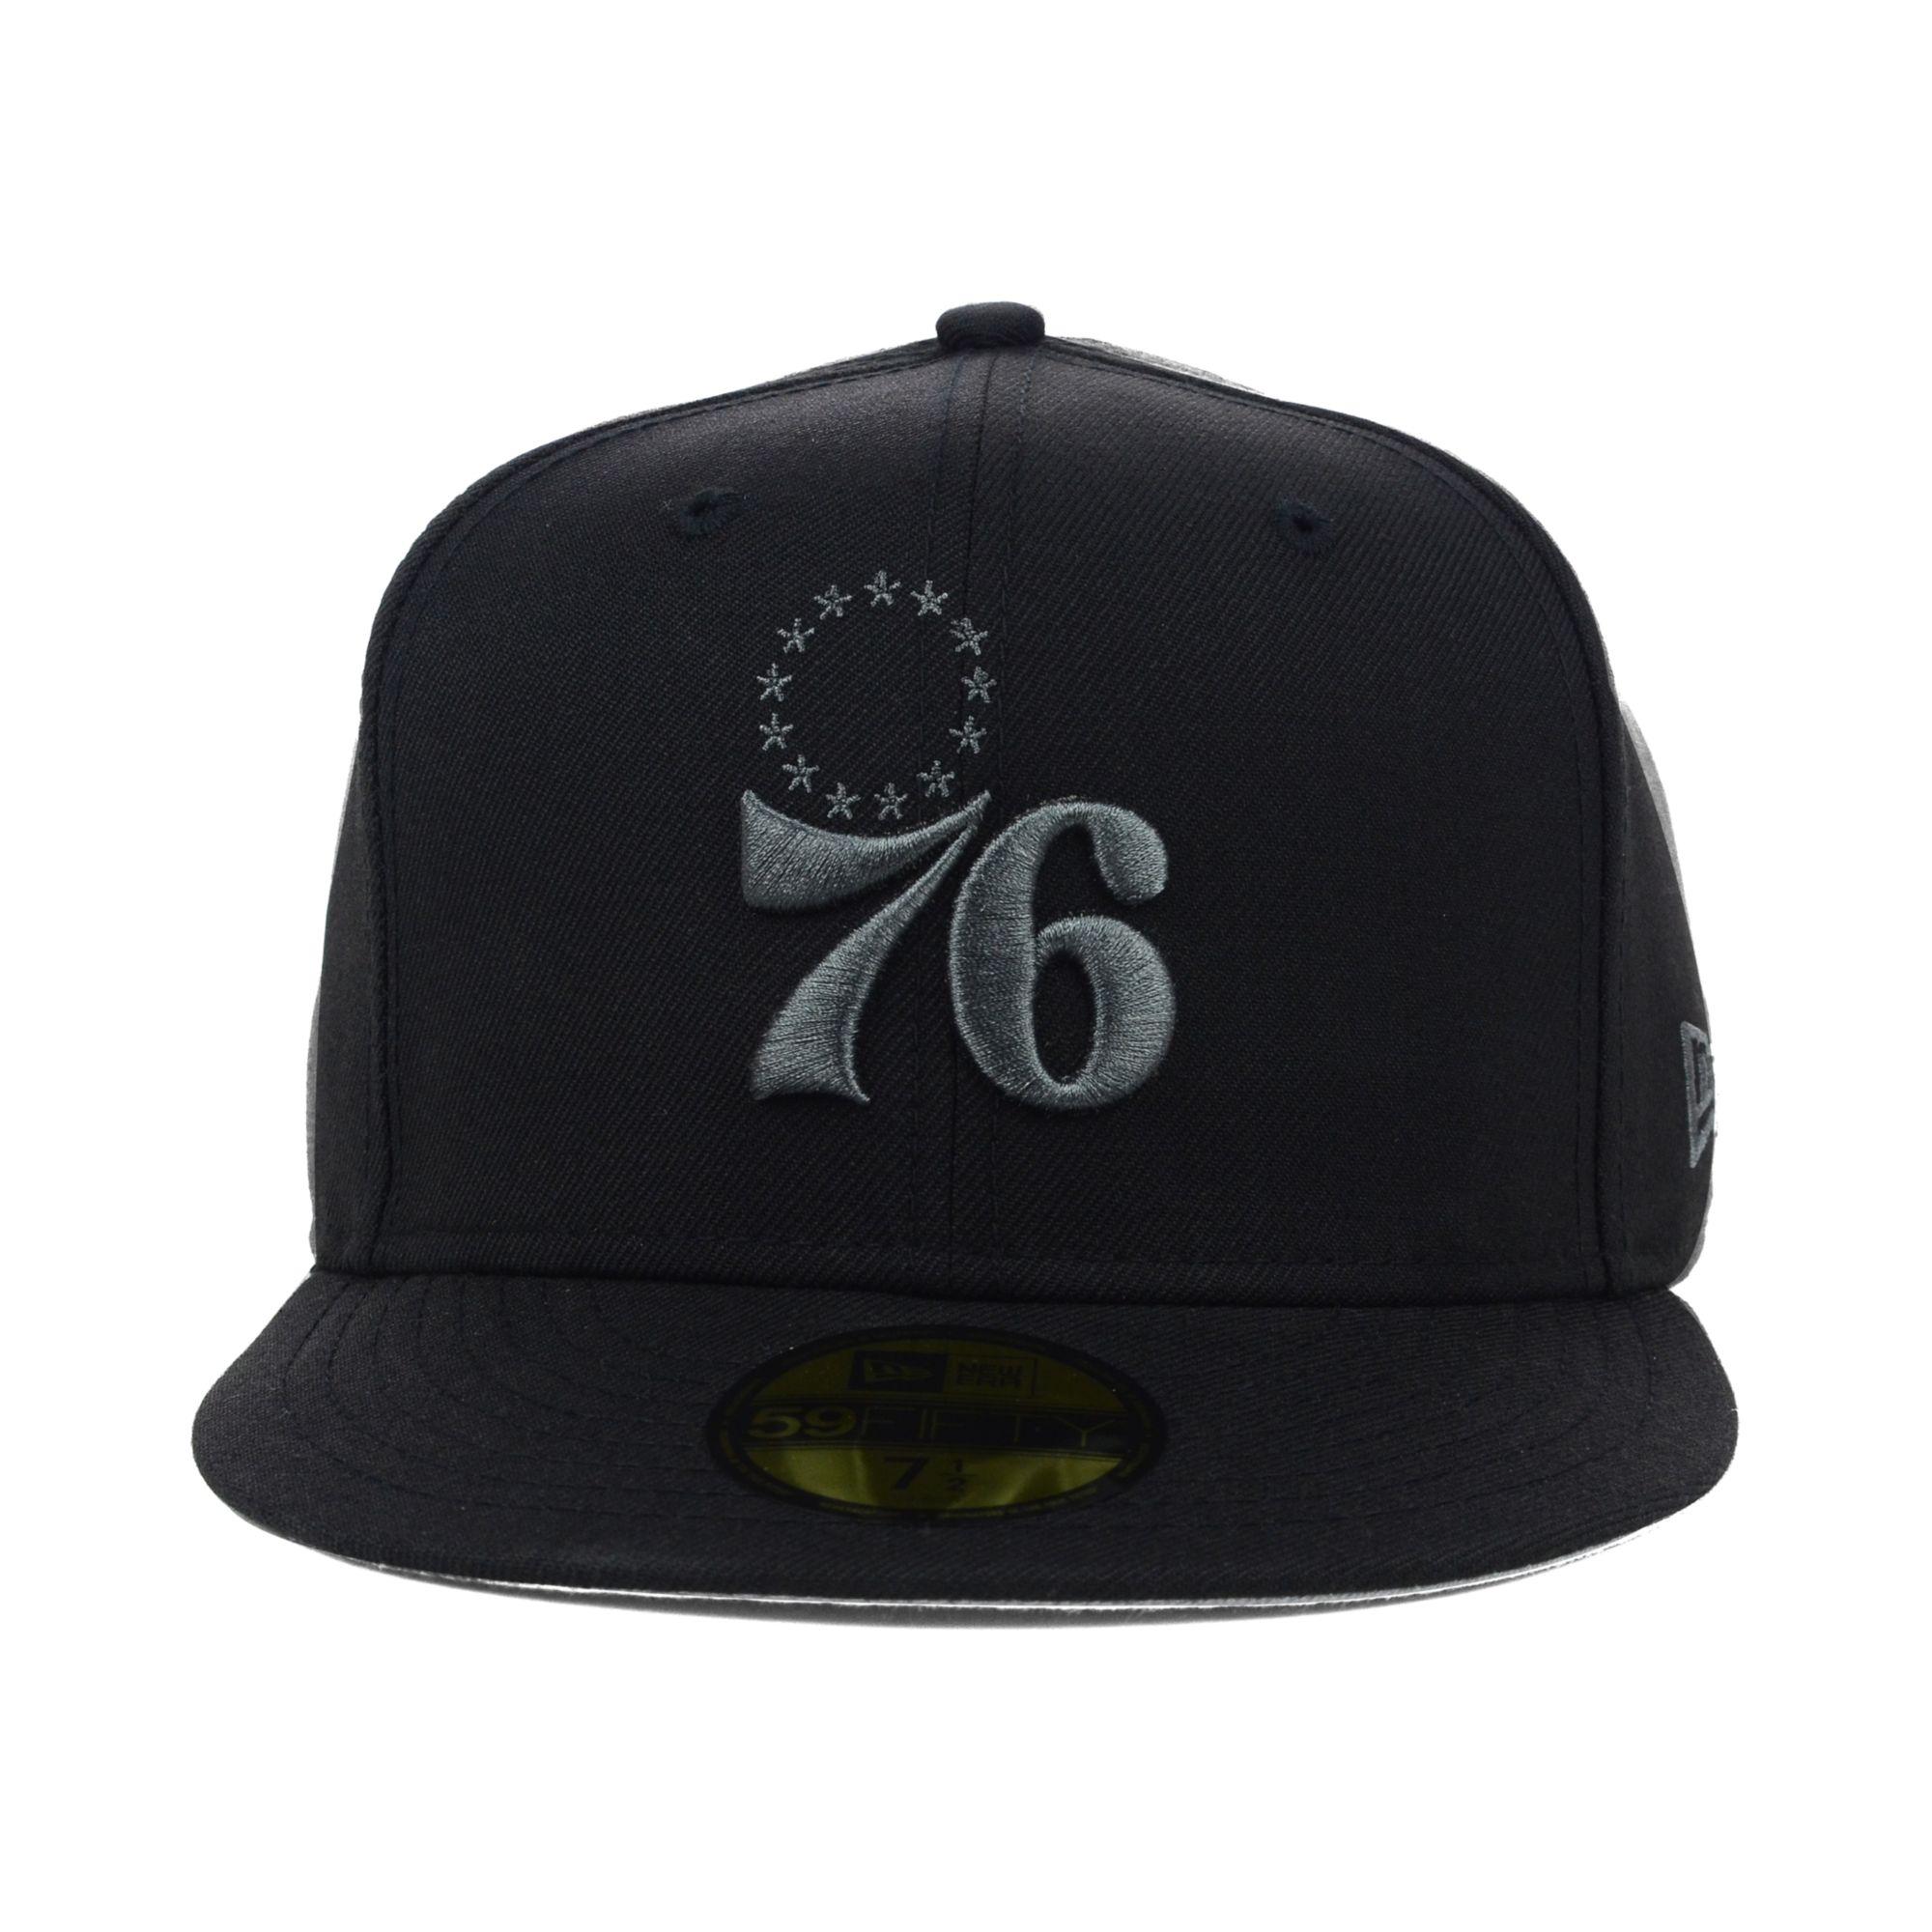 3cf9d5c9c54 Lyst - KTZ Philadelphia 76ers Nba Hardwood Classics Black Graphite ...